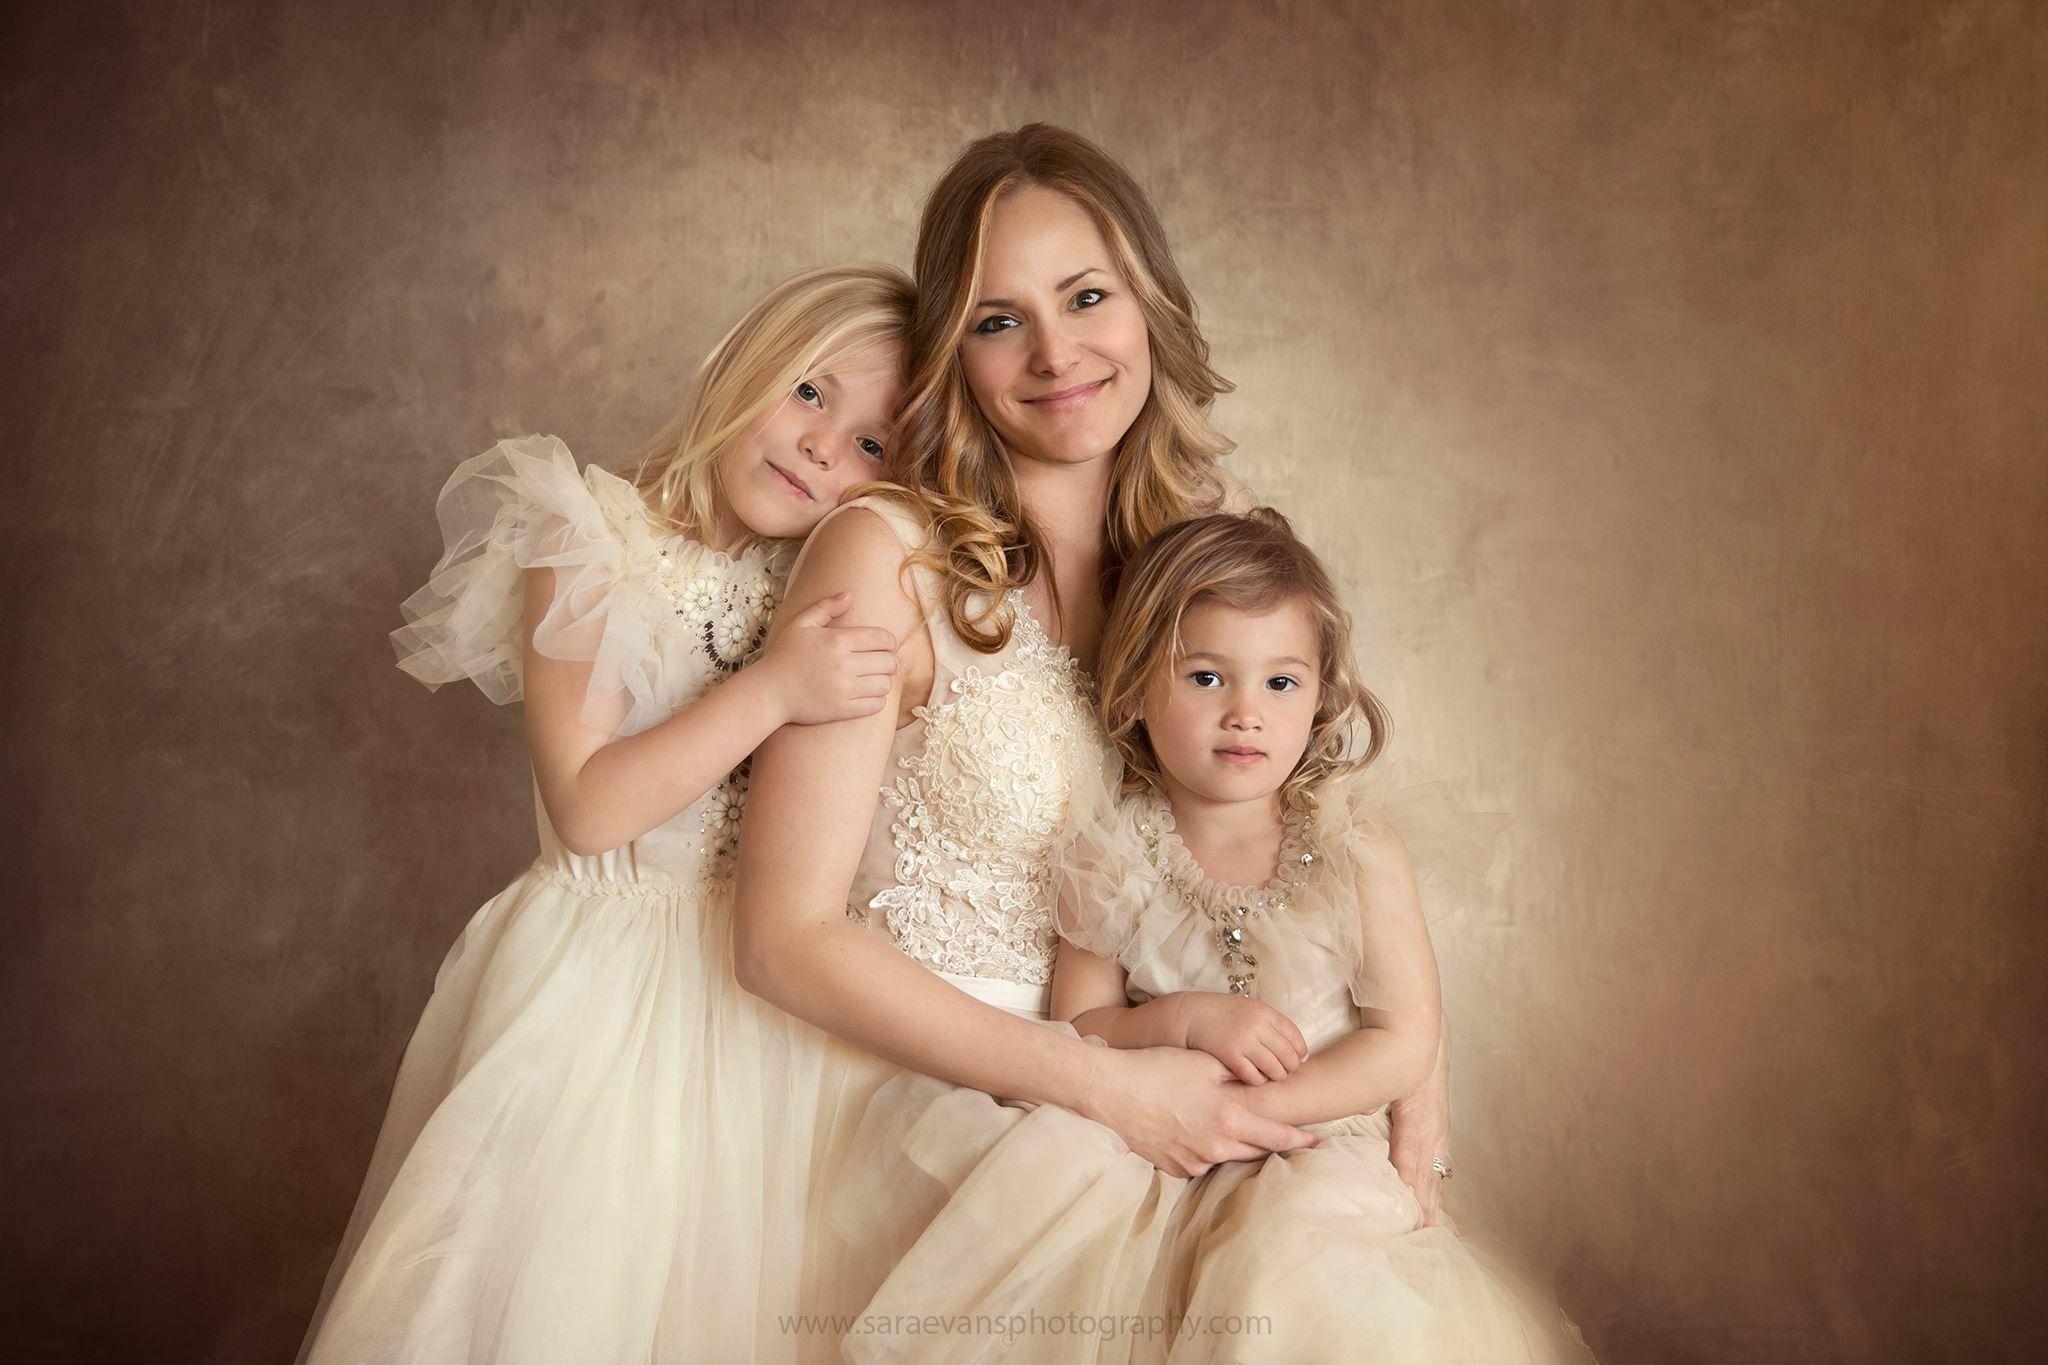 Mommy & Me Glamour: Maegan Hall Photographer makeover